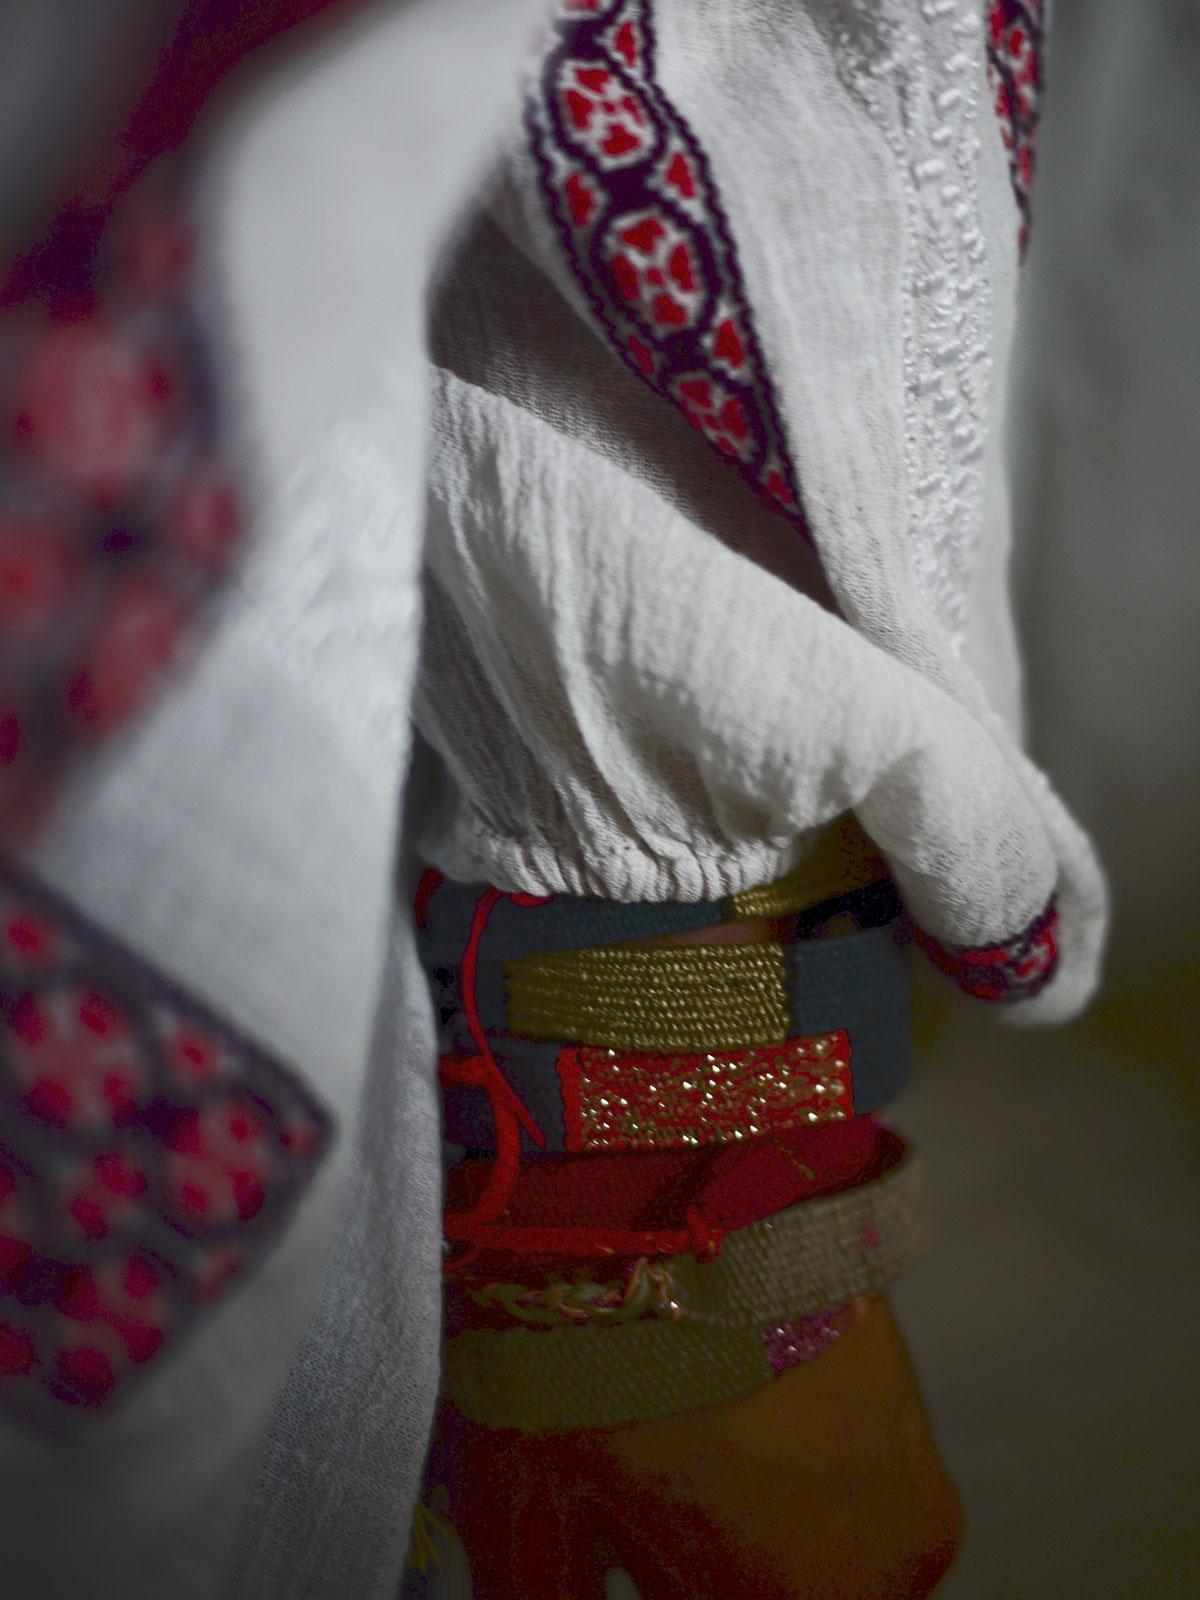 Bracelets LOOM - Design textile by Myriam Balaÿ myriam-balay-chemise-loom DETAILS L'appartement